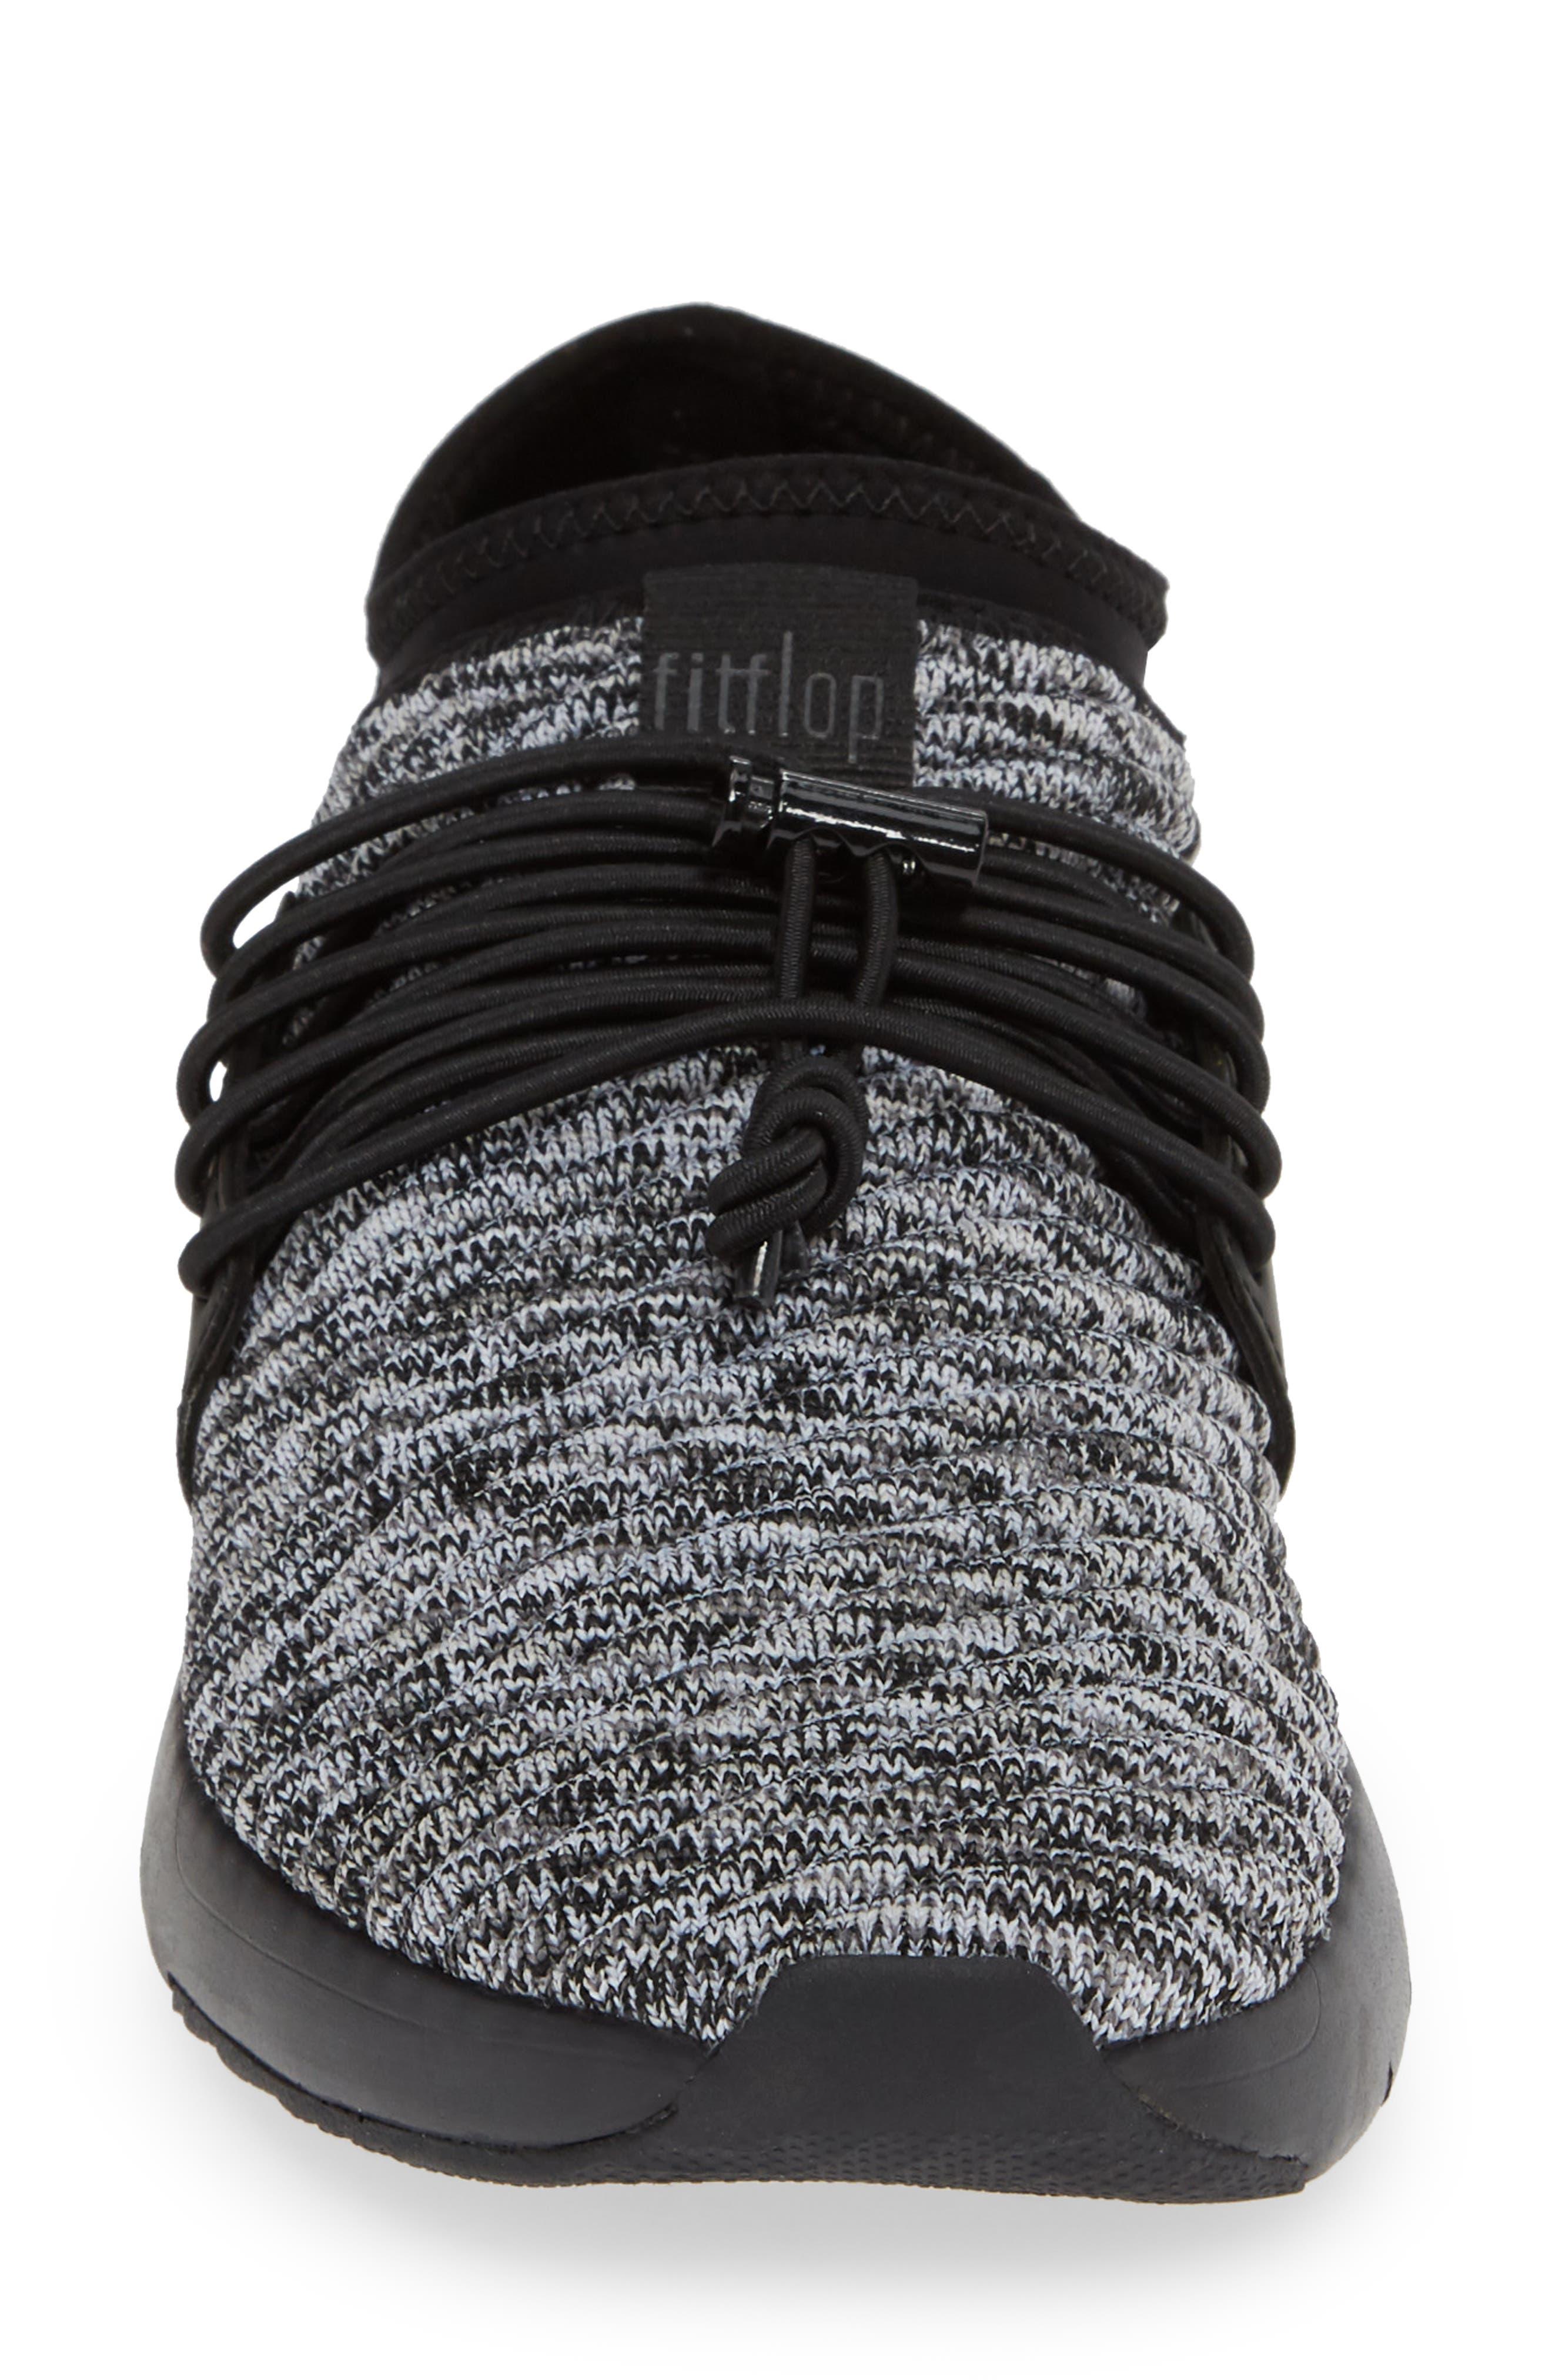 FITFLOP, Artknit Sock Sneaker, Alternate thumbnail 4, color, 017